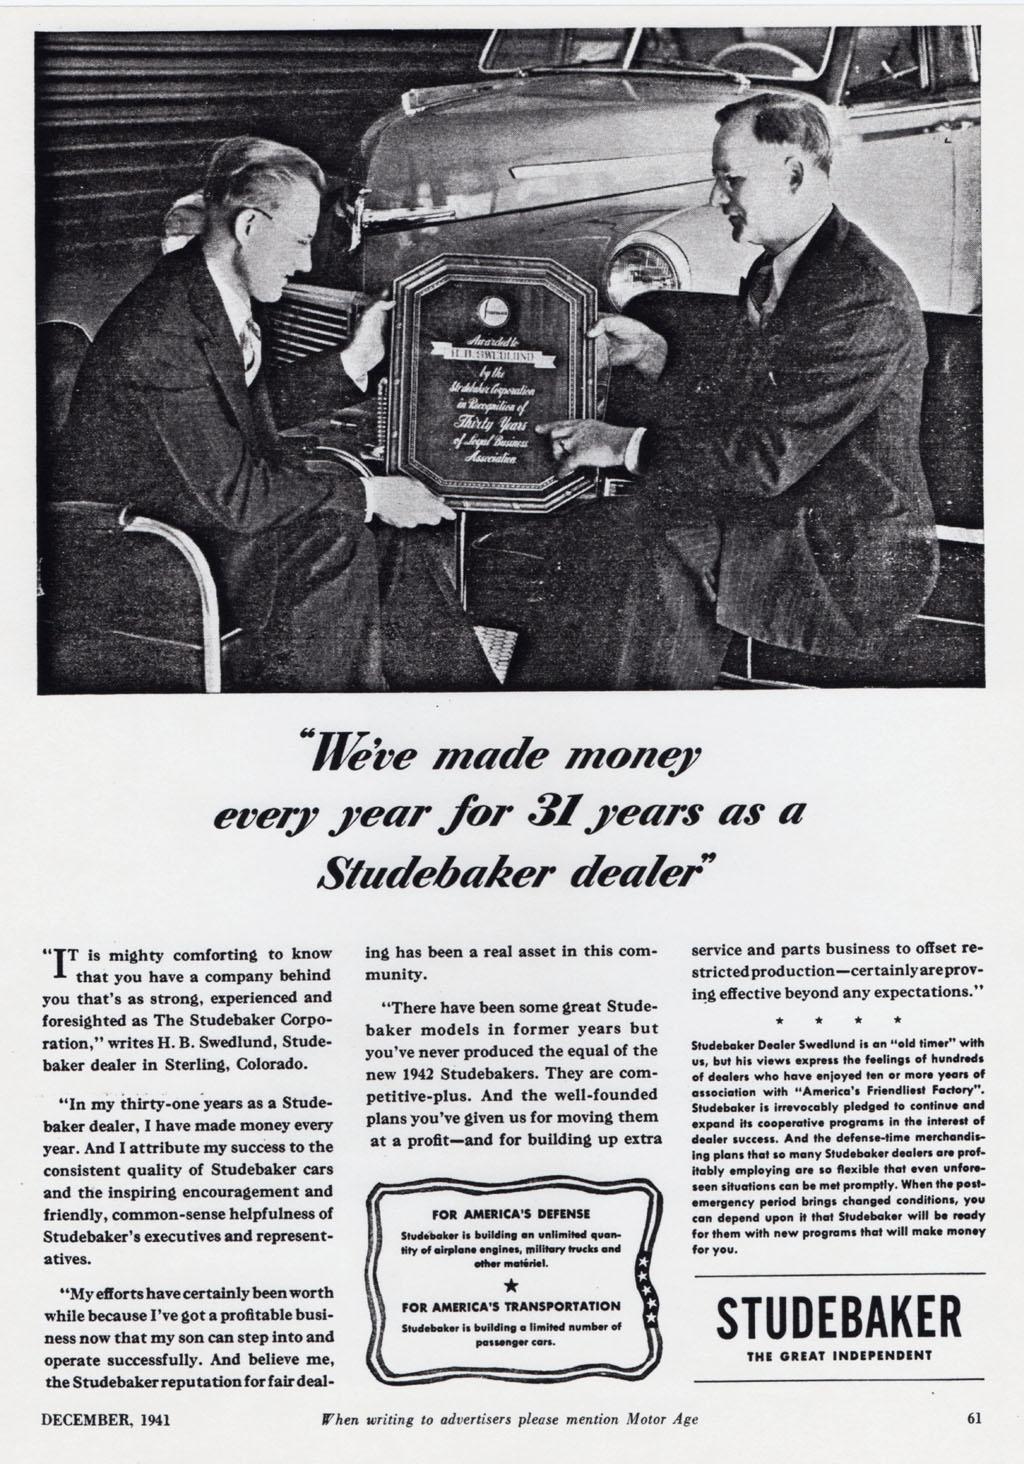 Bobs Studebaker Resource Website Dealer Listing Electrical Wiring Diagram For 1941 1948 All Trucks Harry Benjamin Swedlund Sterling Co C 1912 Ref 08 Apr 2013